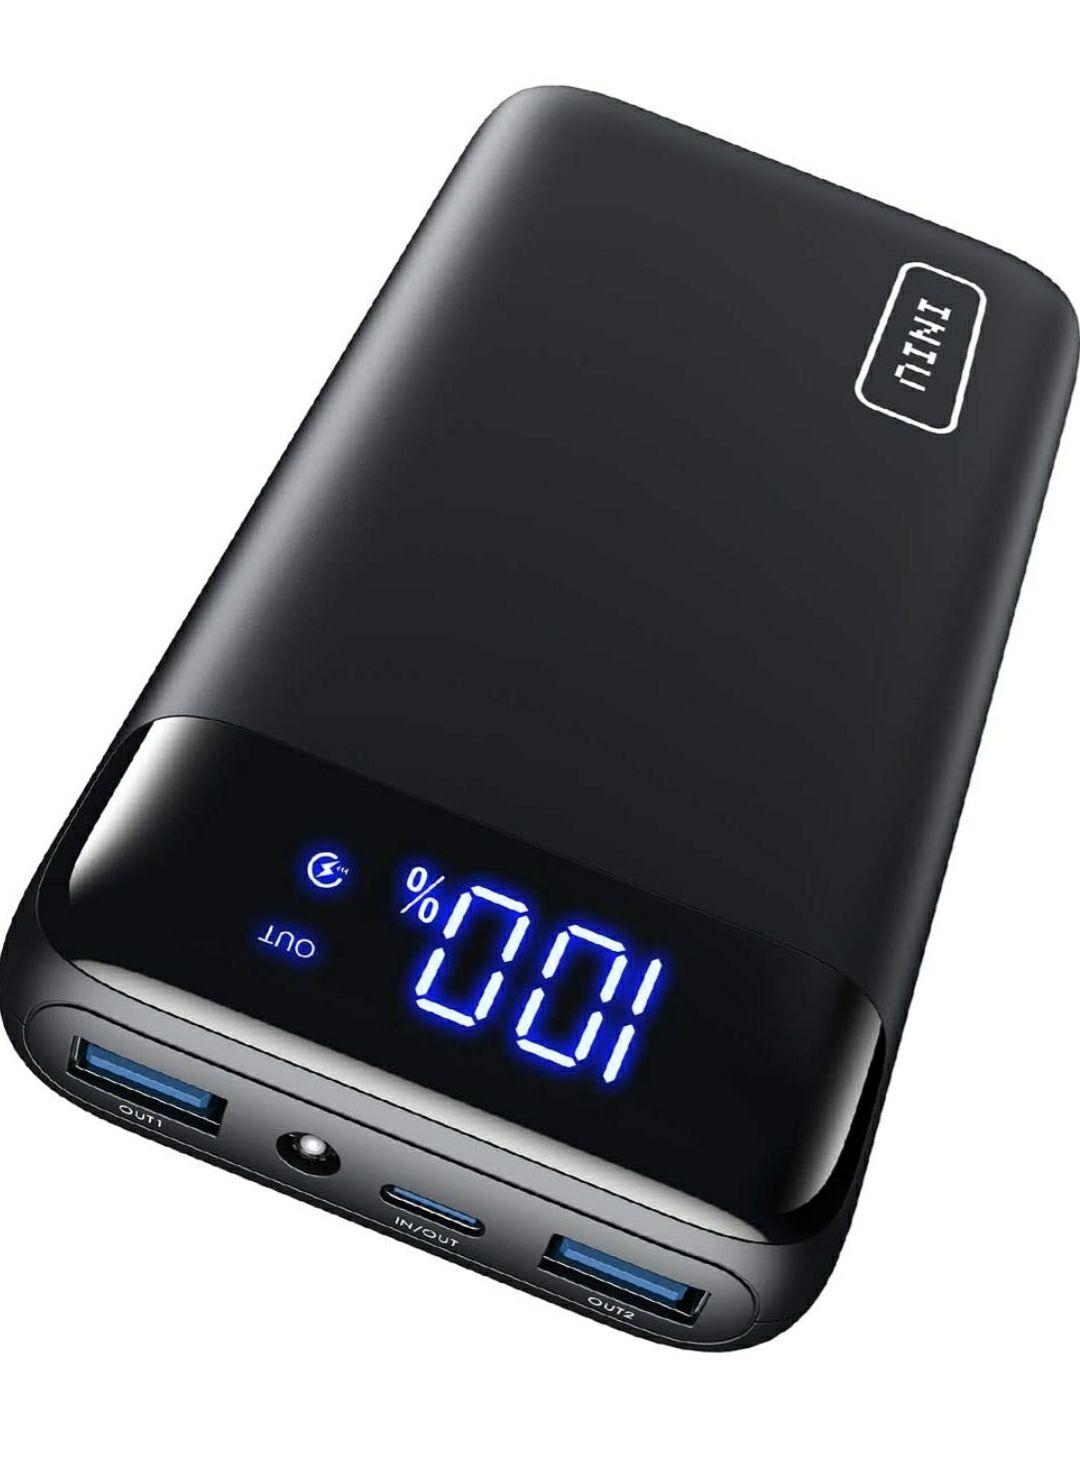 INIU Power Bank 20000mAh, 20W PD3.0 QC4.0 Carica Super Rapida con Display LED